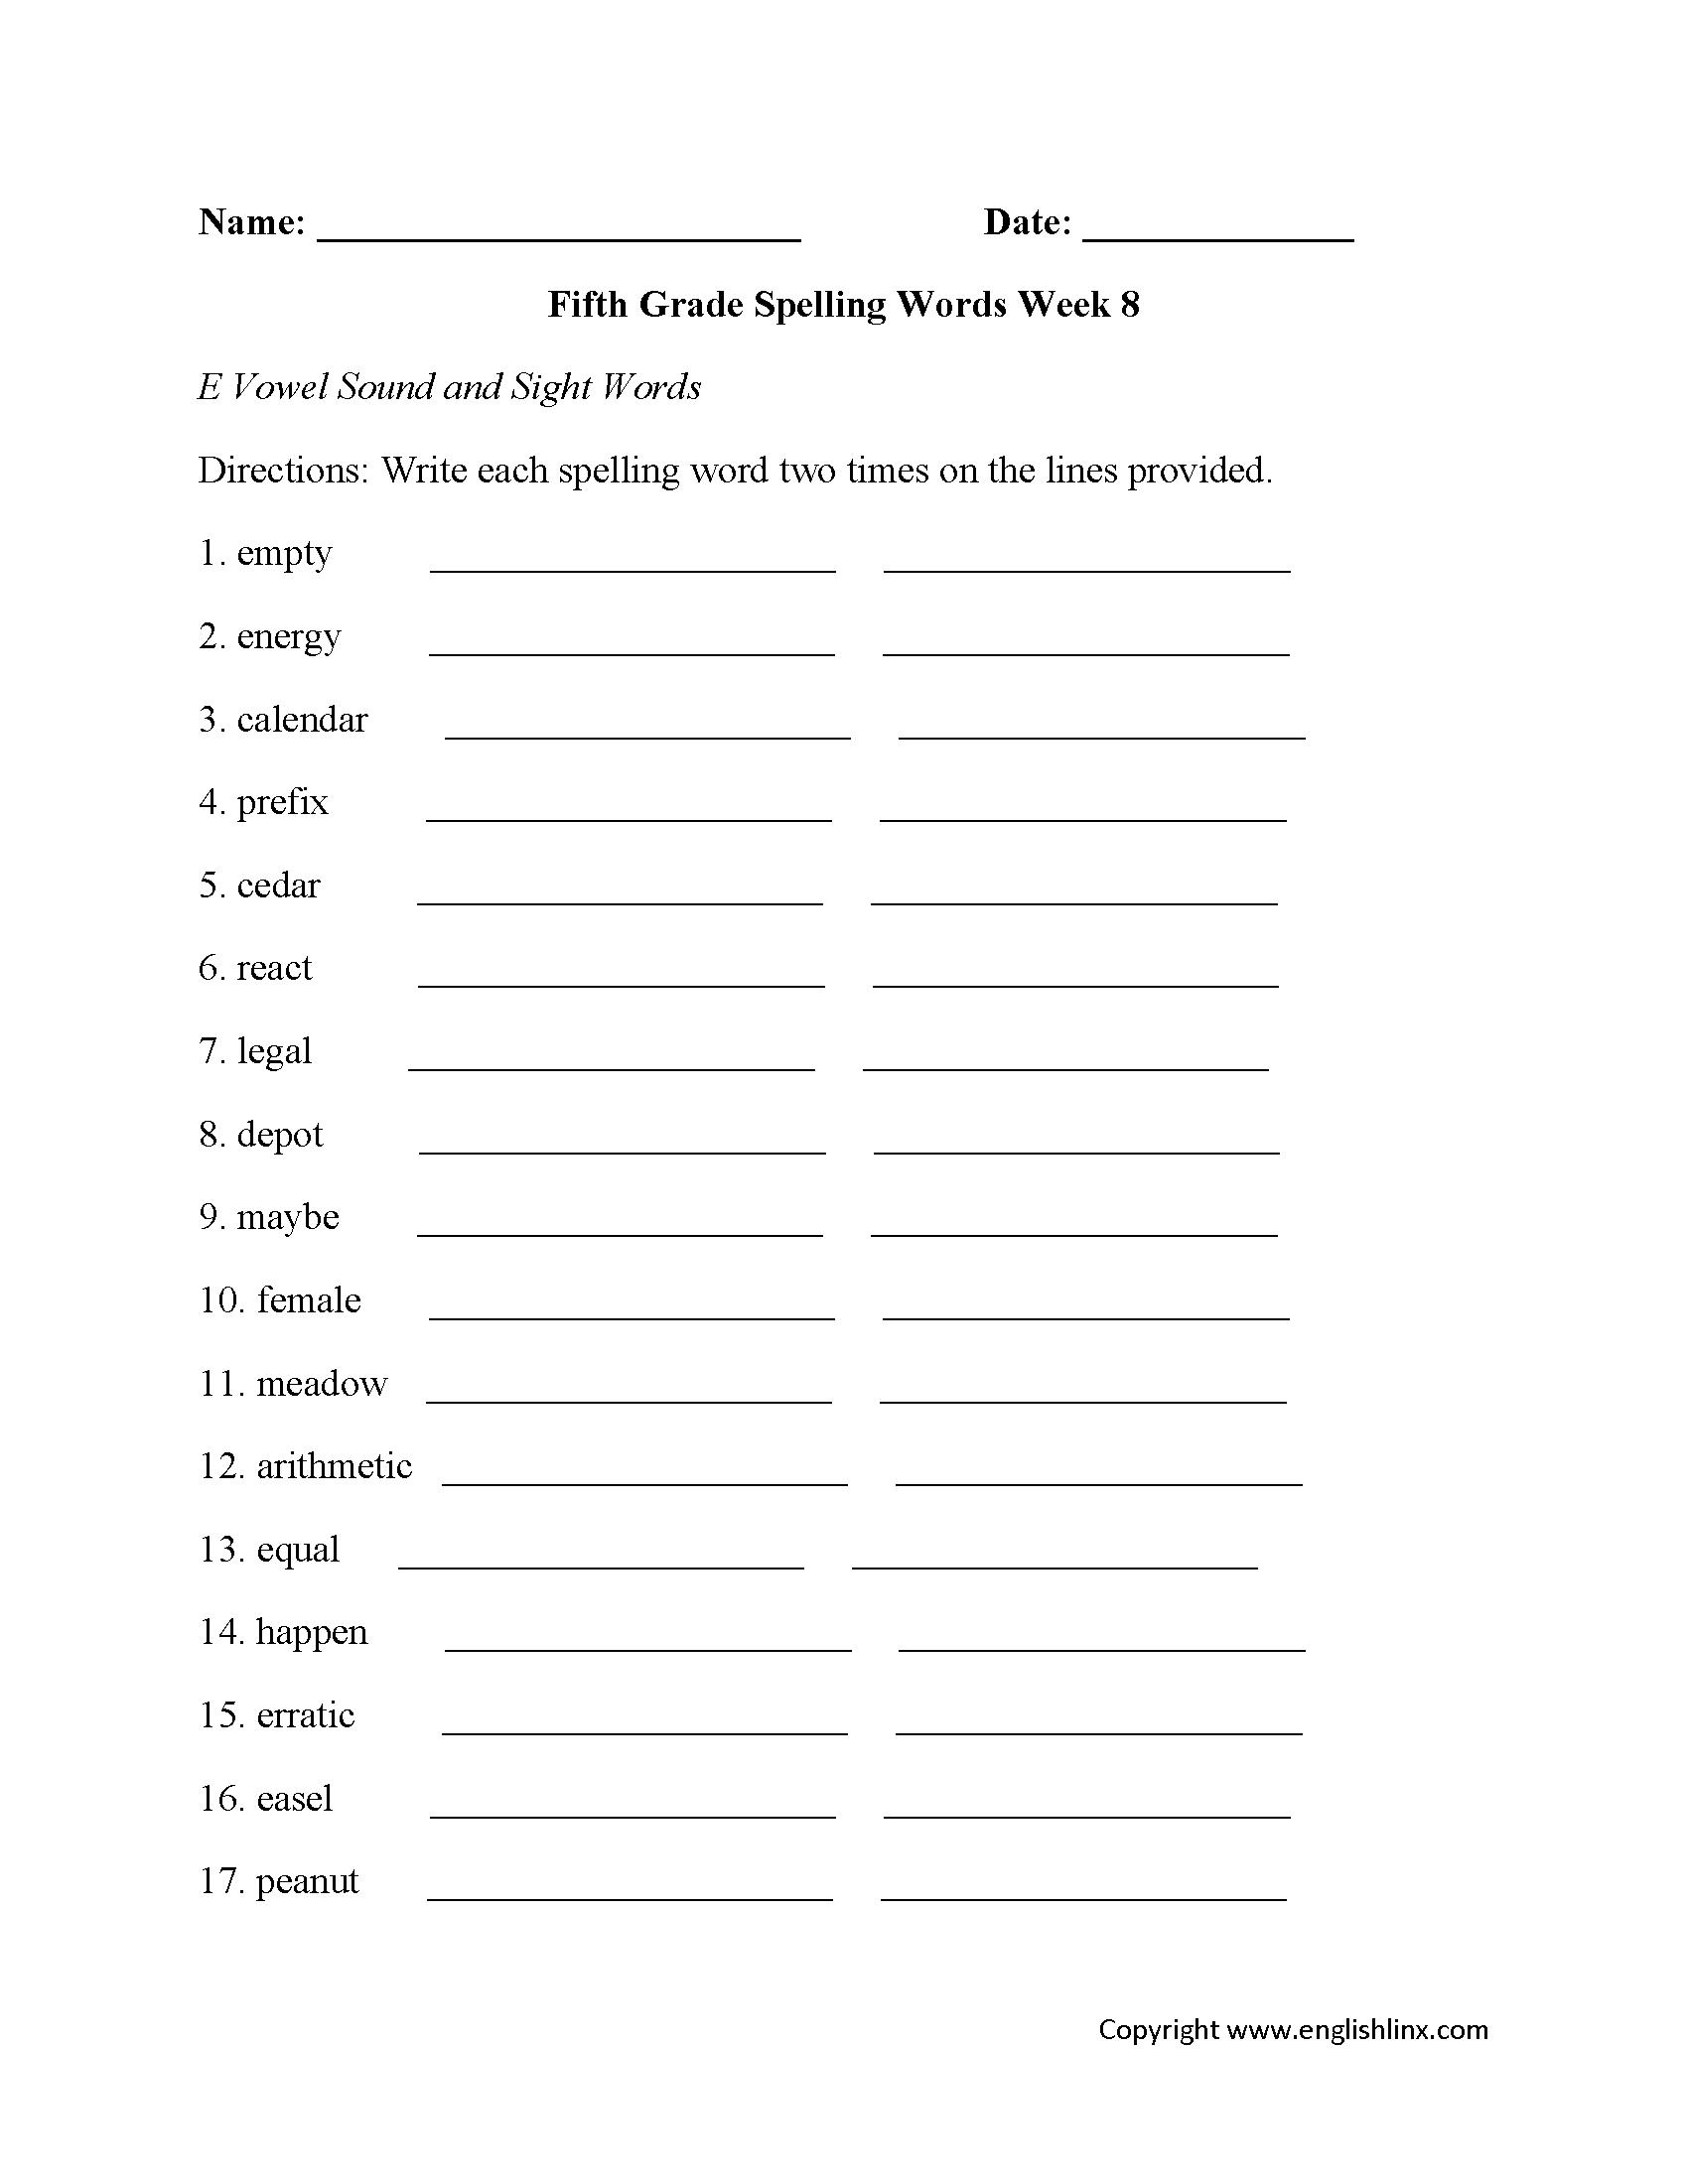 Week 8 E Vowel Fifth Grade Spelling Worksheets